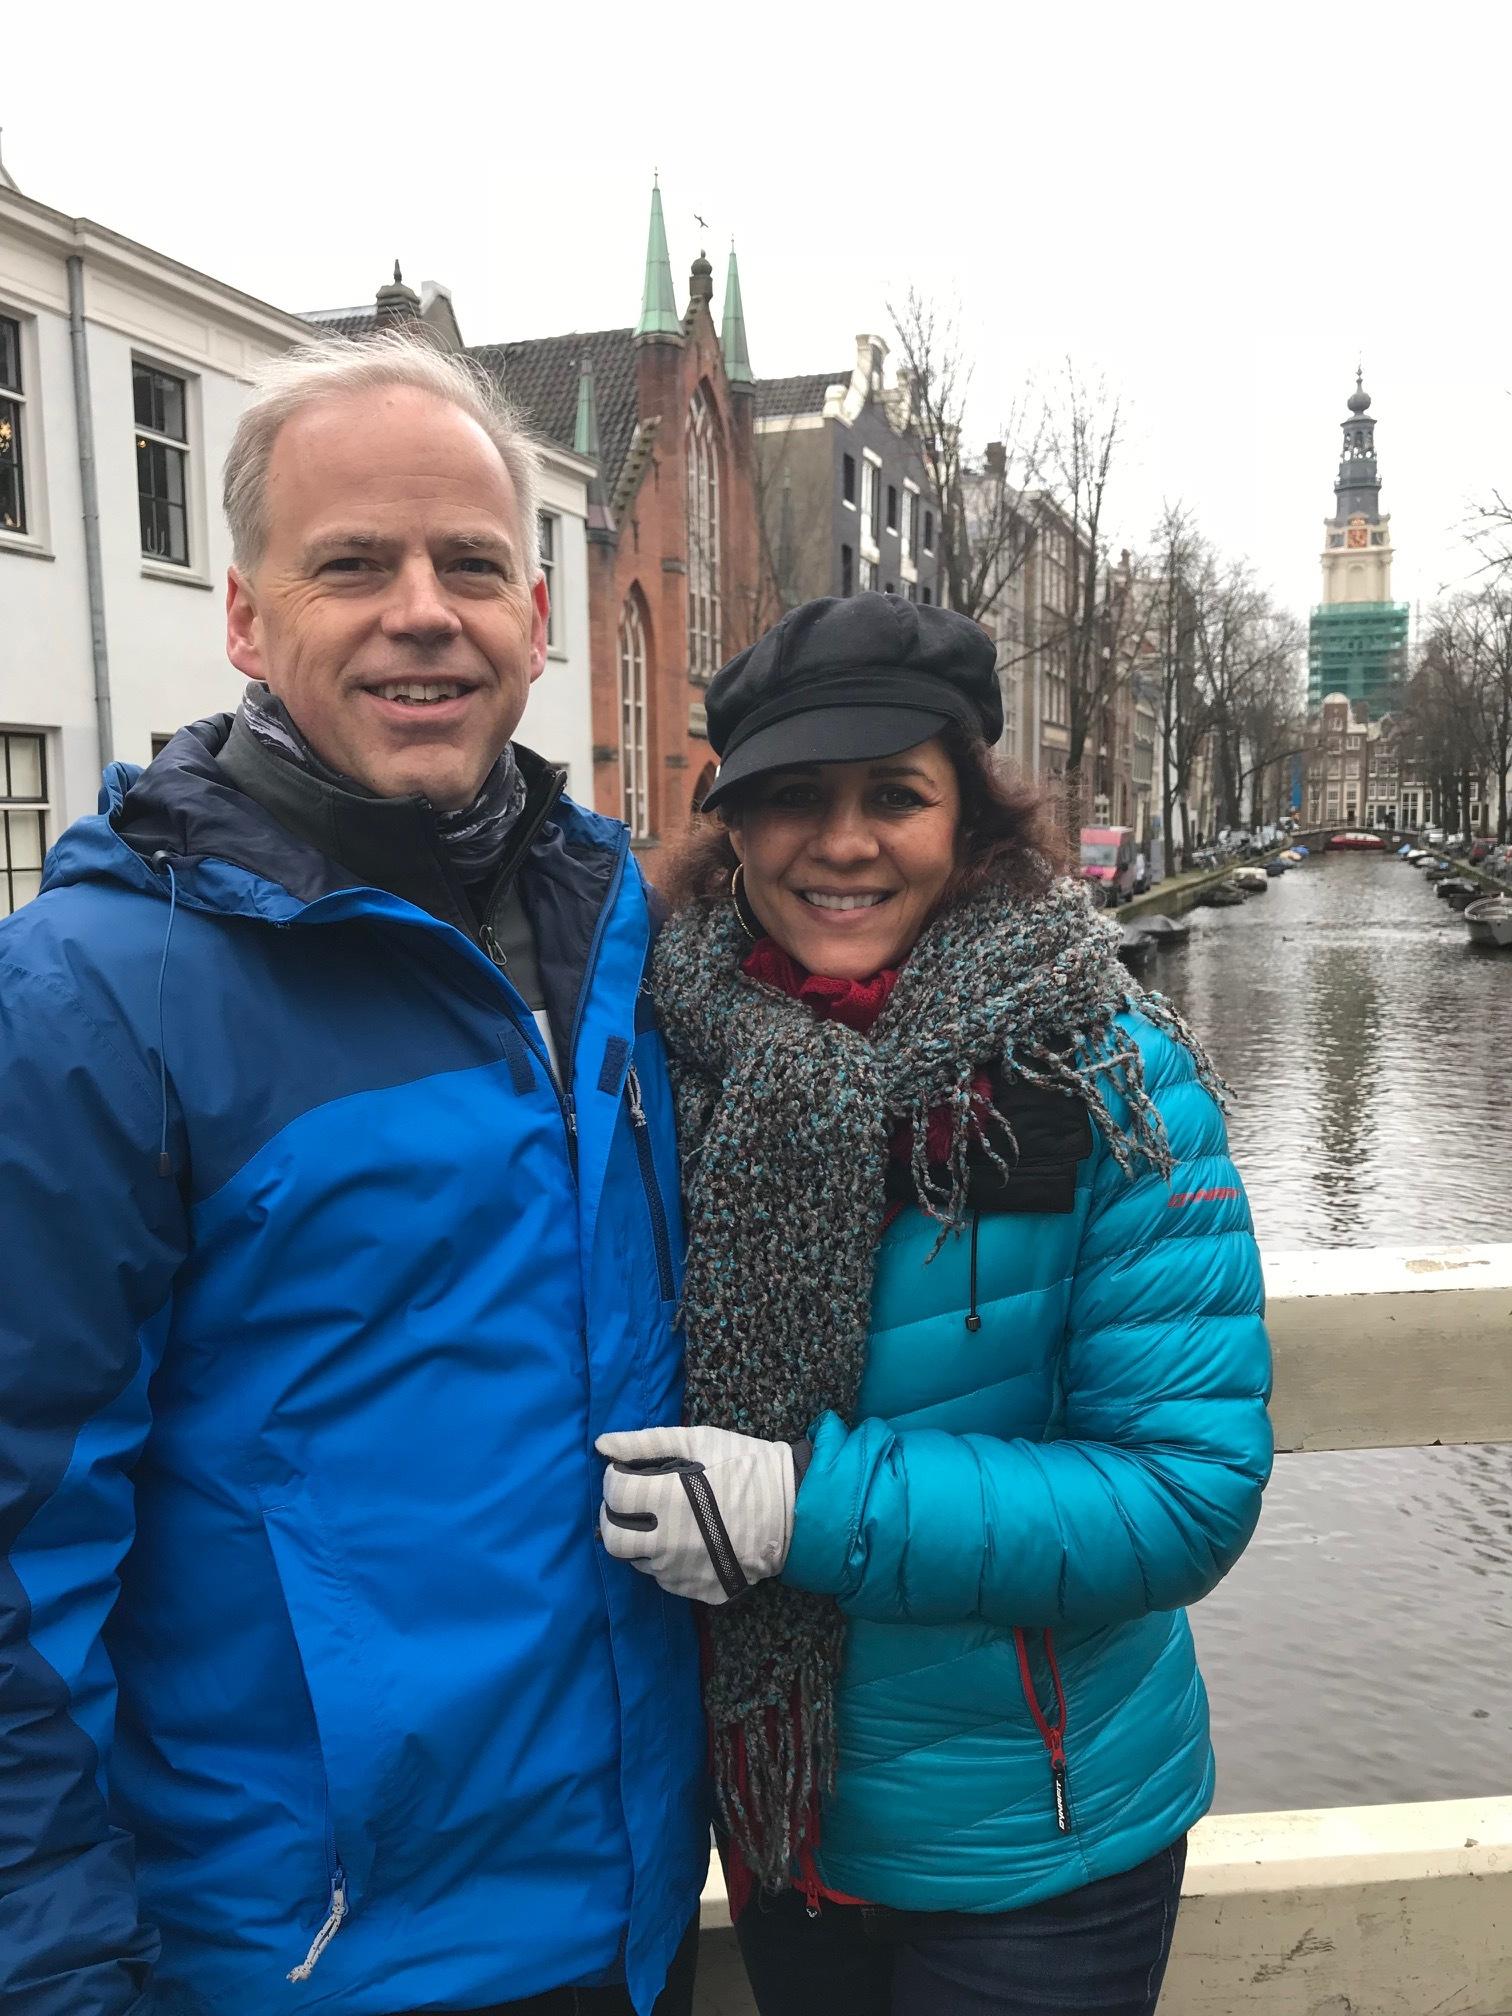 Derek and Cindy In Amsterdam